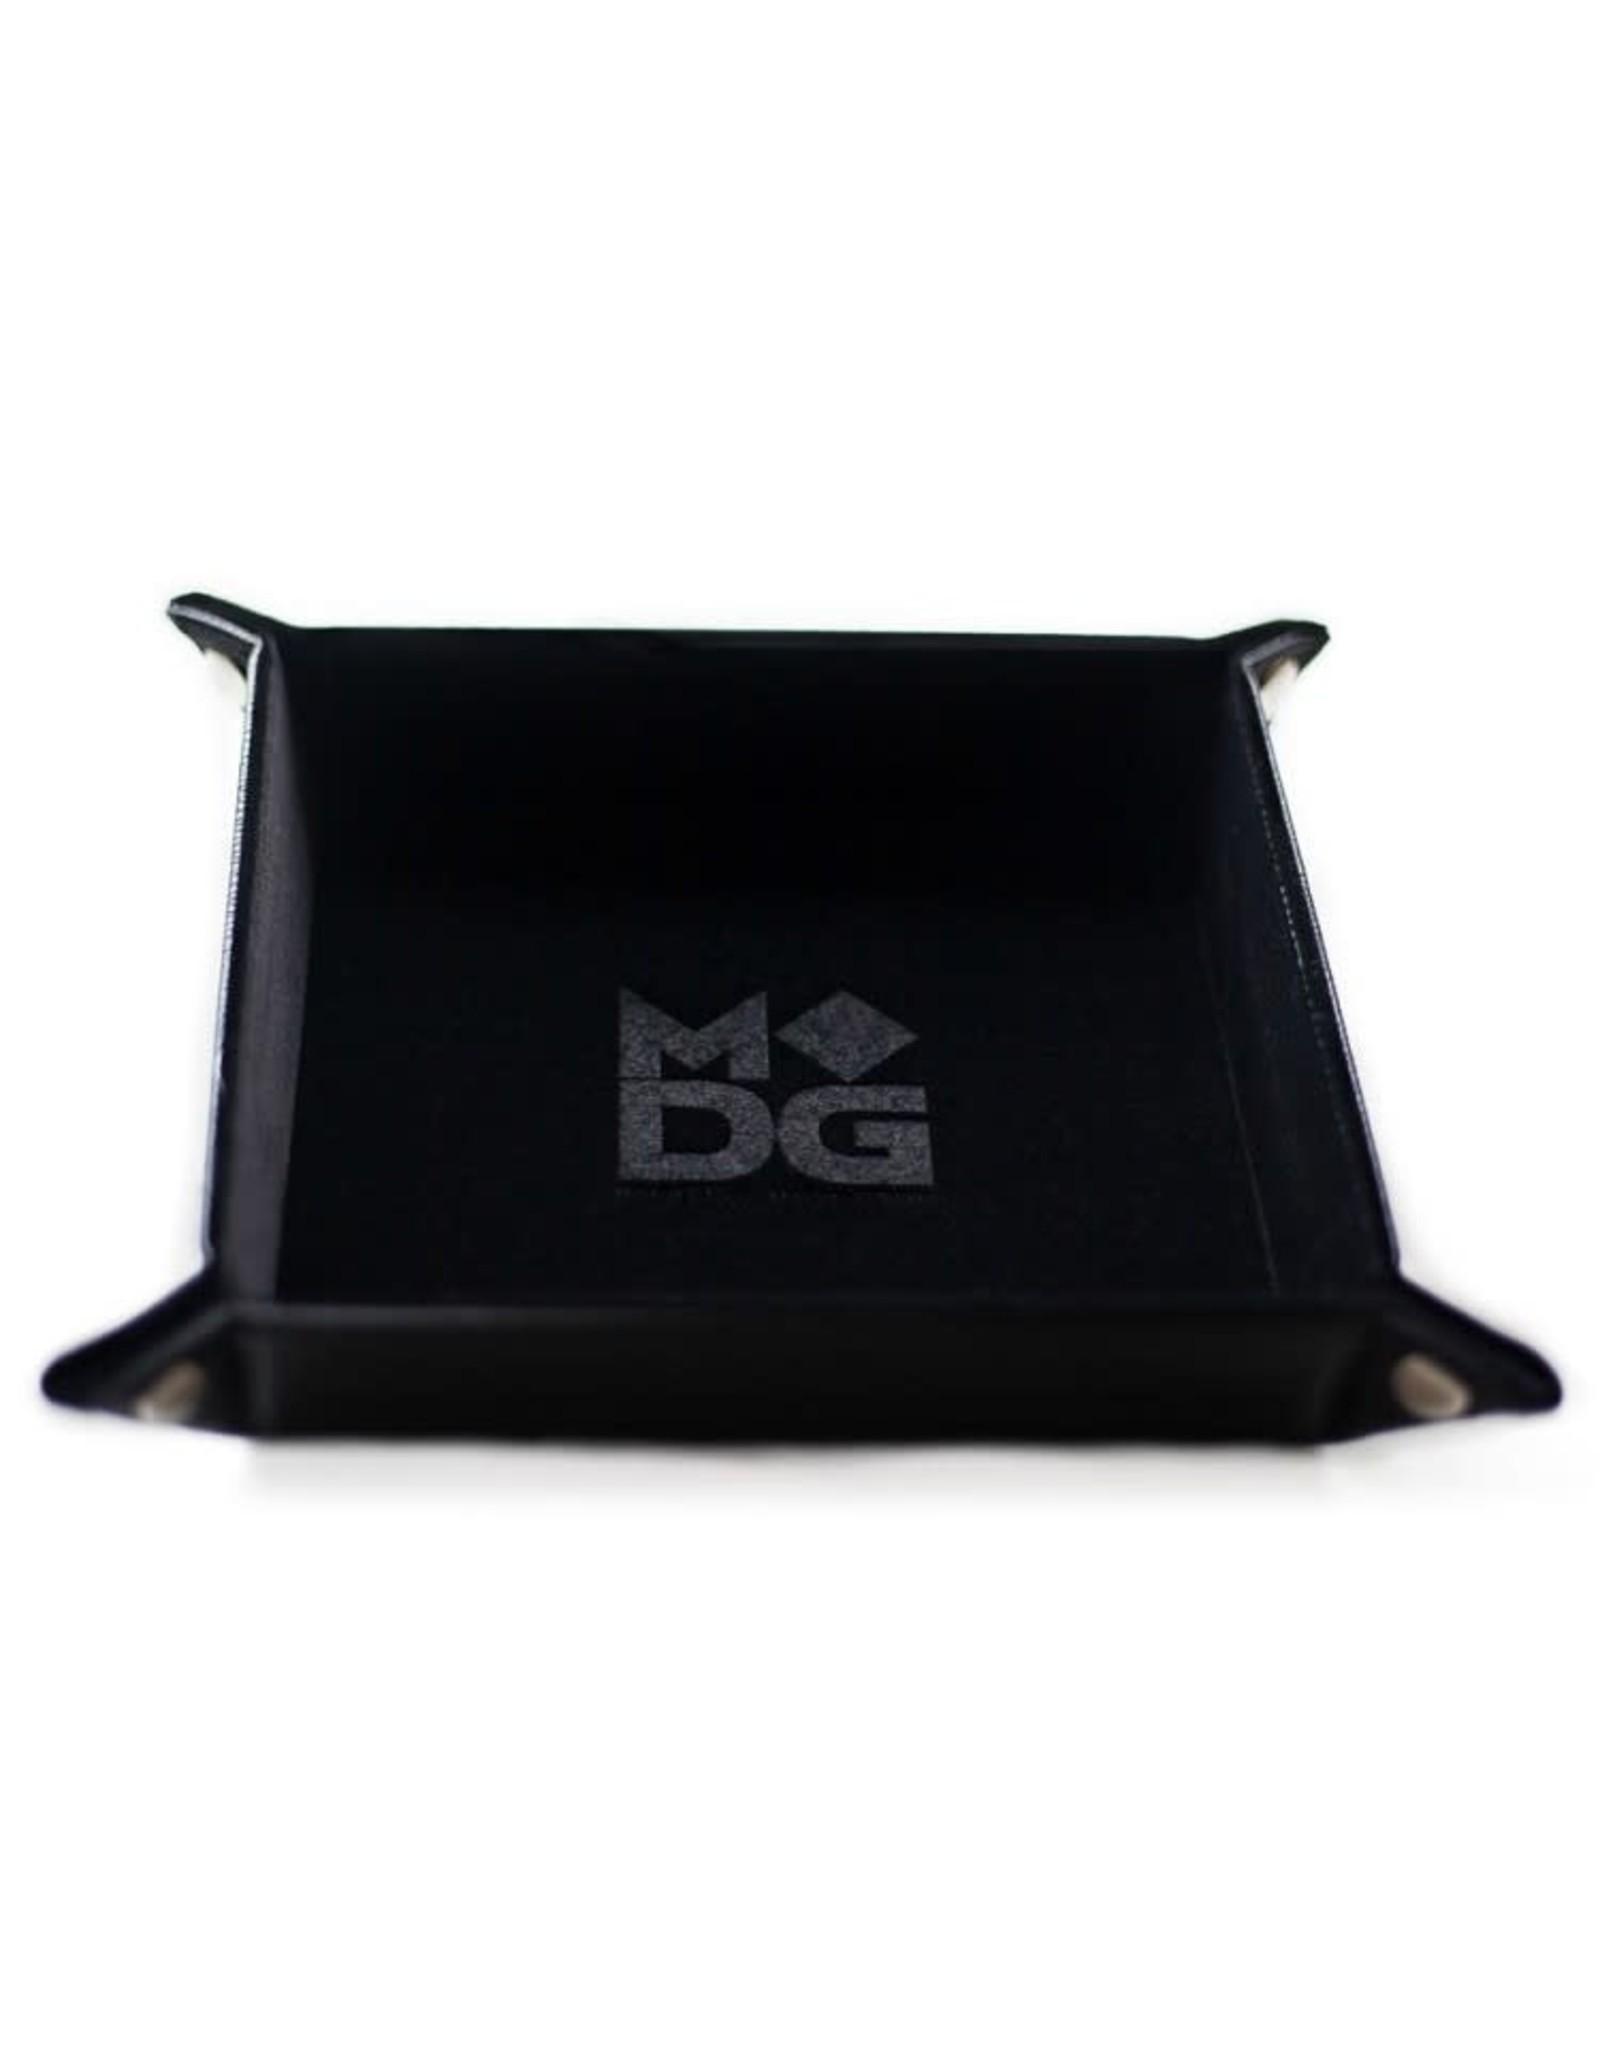 Metallic Dice Games Folding Dice Tray: Velvet 10x10 BK